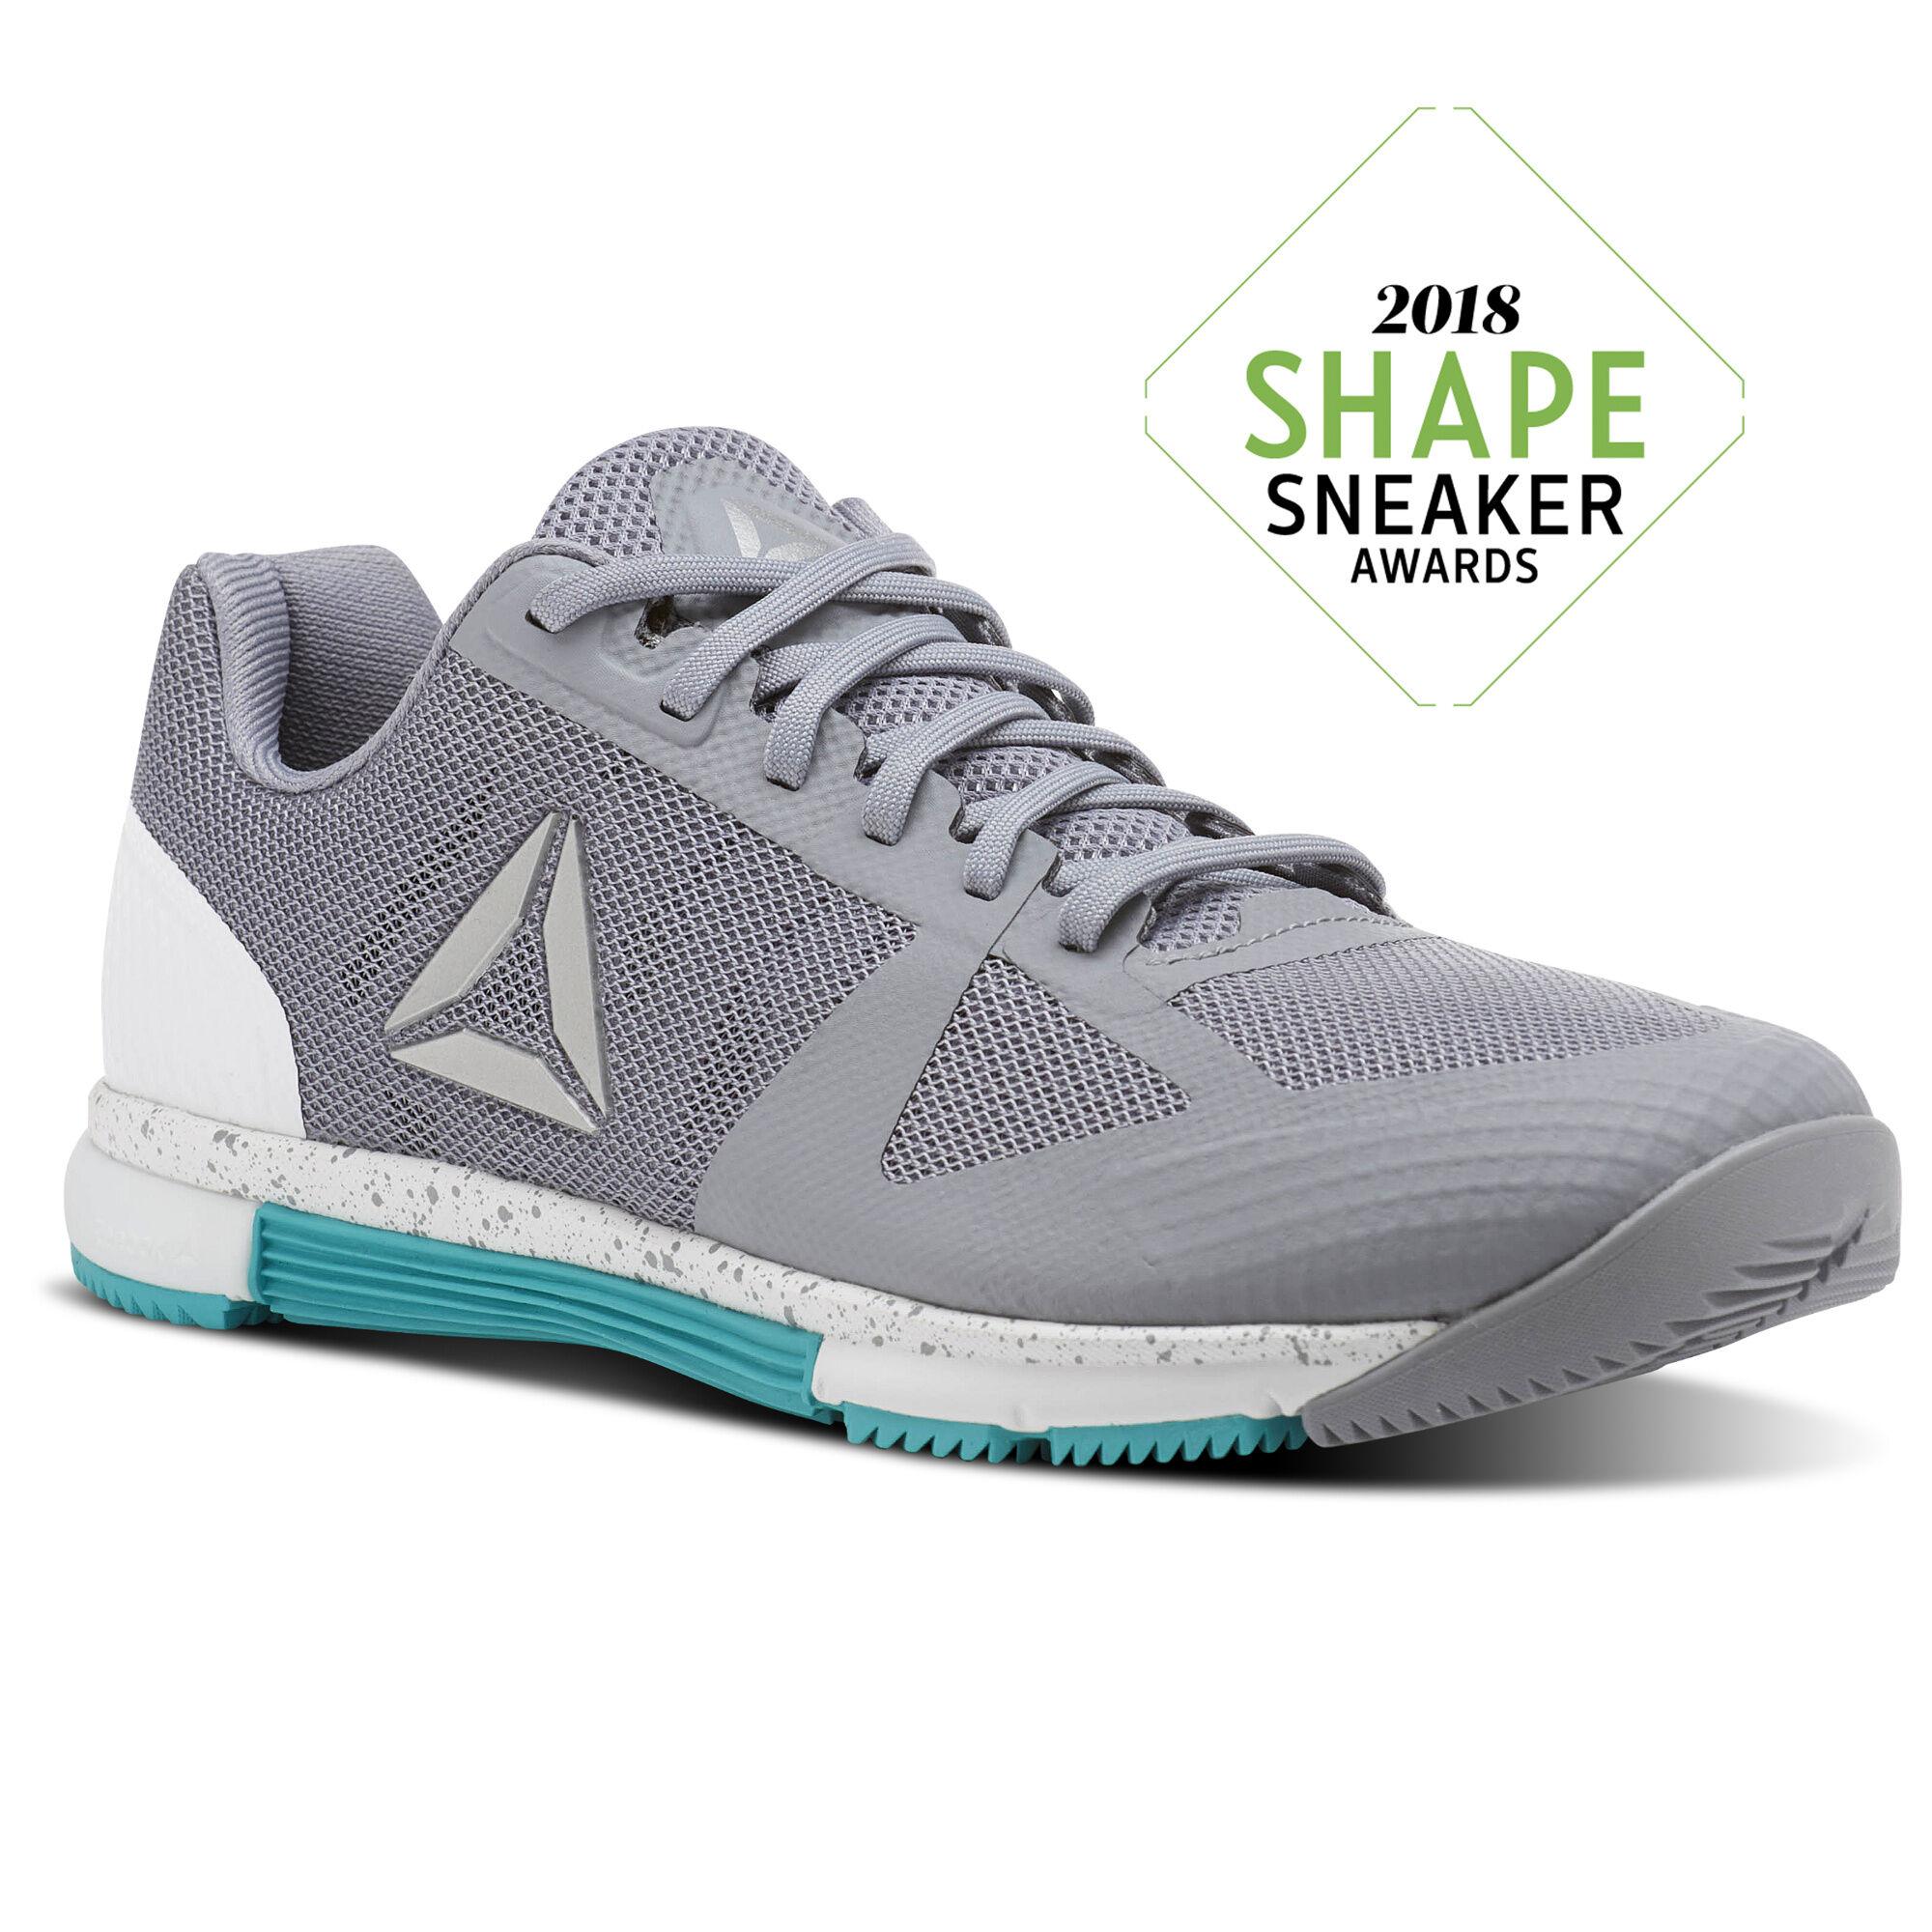 f8c86a1c60ff1 germany reebok running shoes light grey mint green 15111 ae8c7